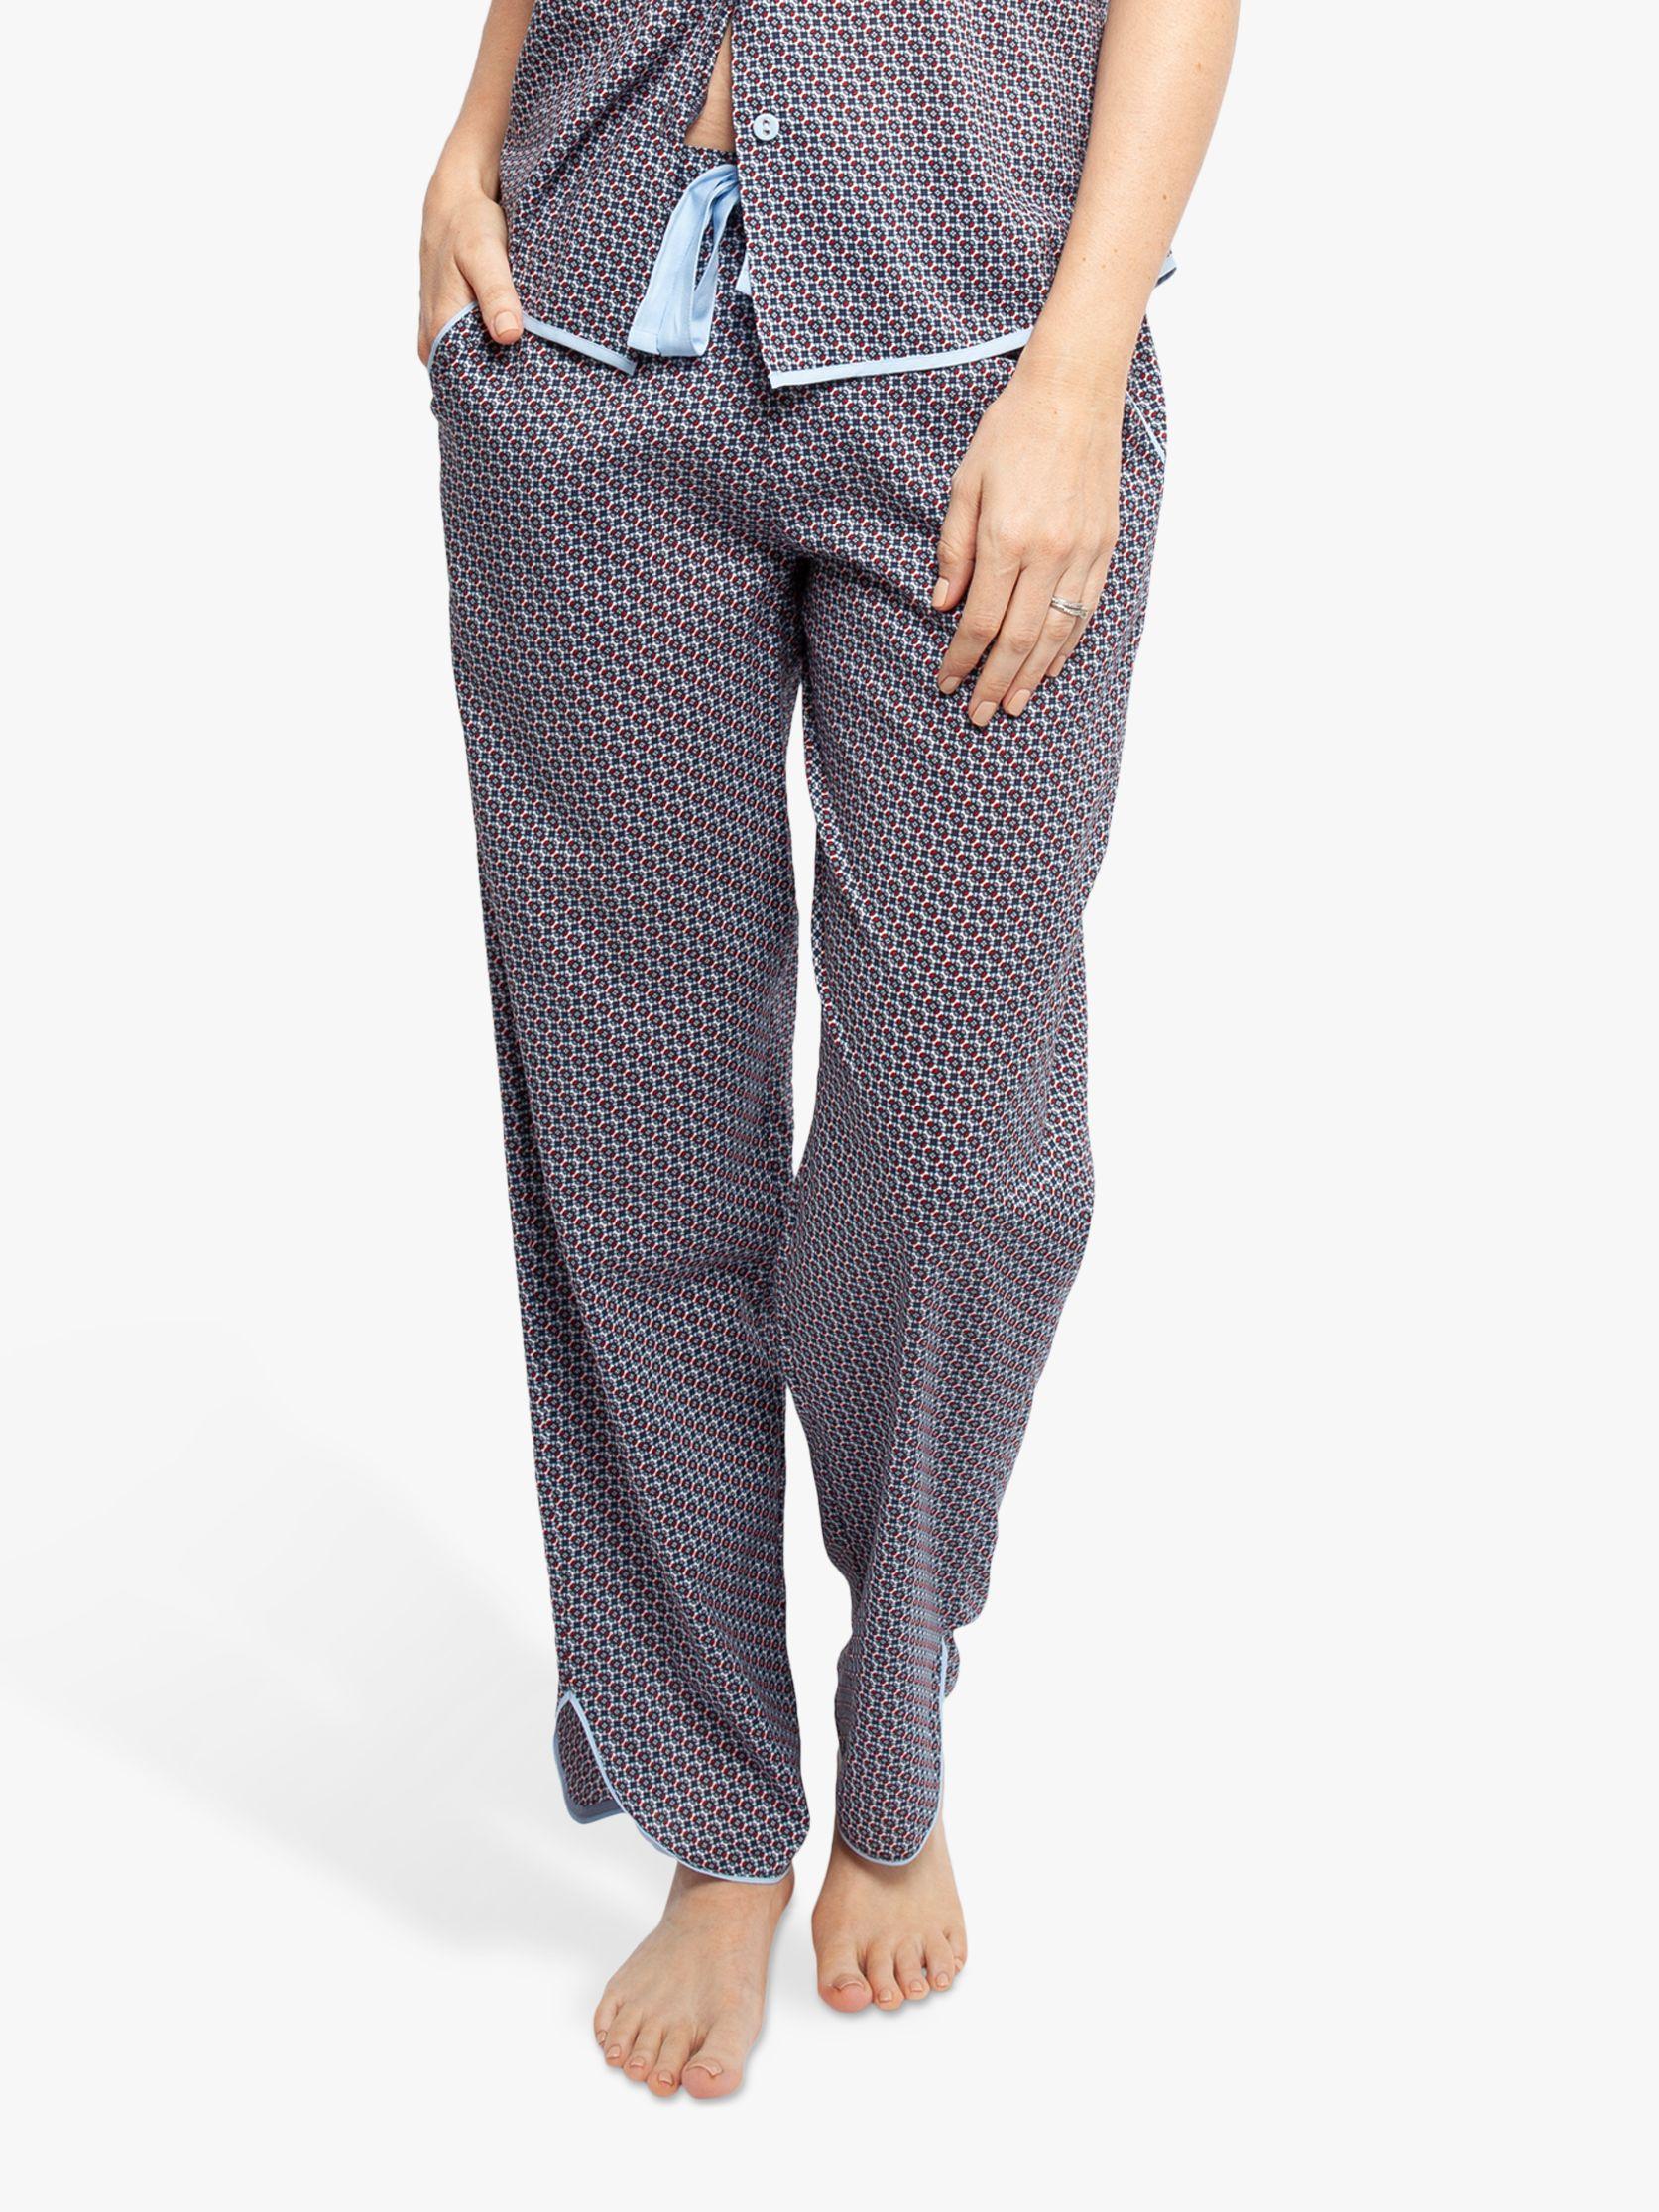 Cyberjammies Cyberjammies Olivia Geo Print Pyjama Bottoms, Grey